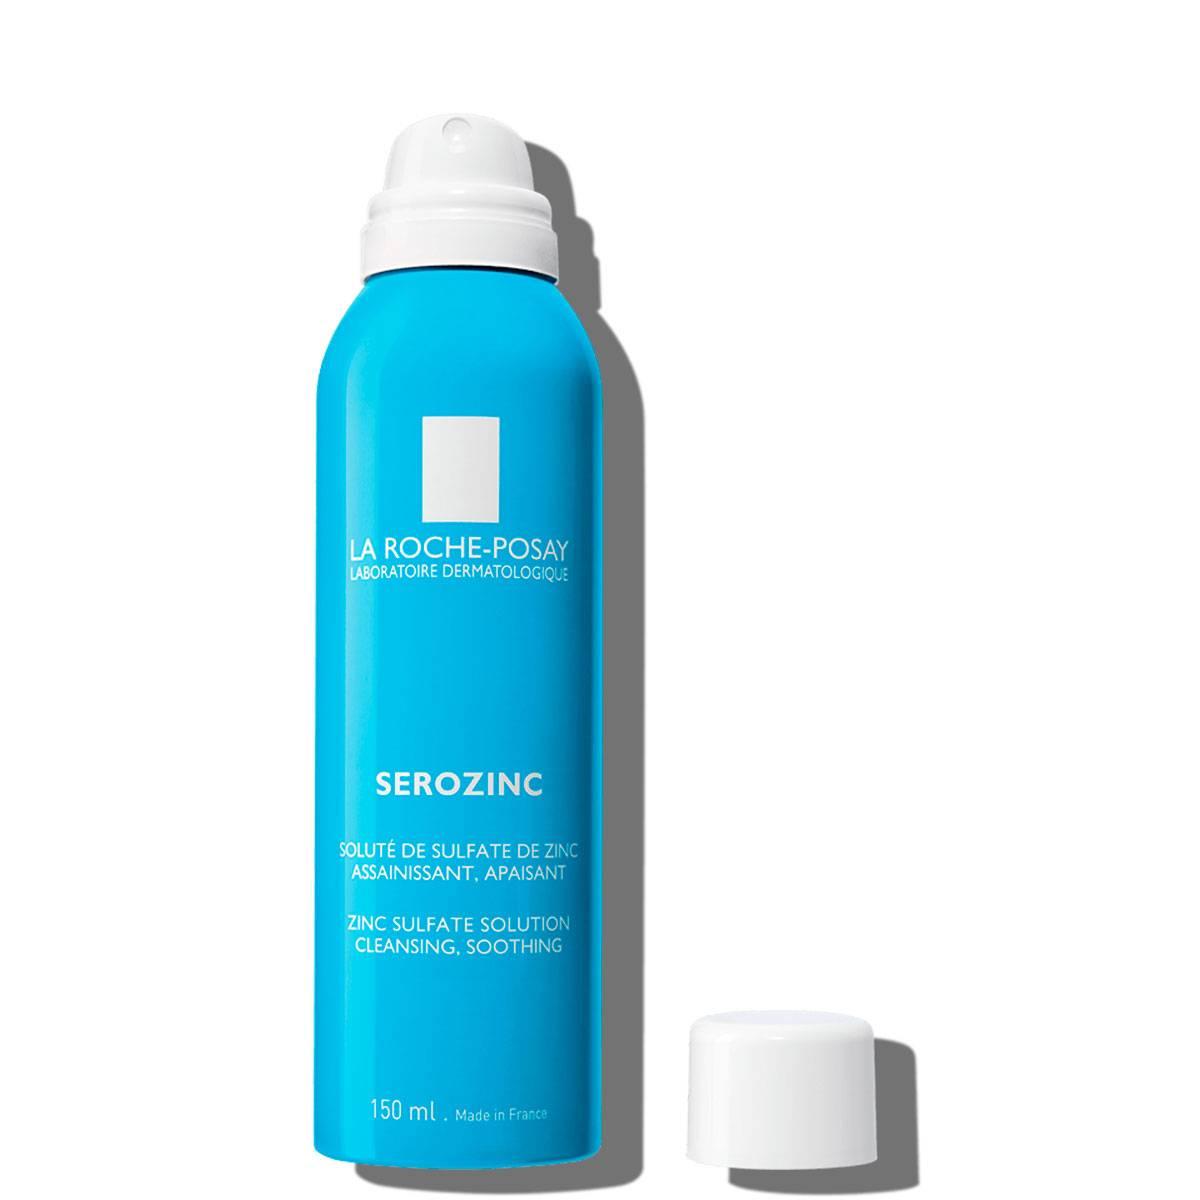 La Roche Posay Tuotesivu Serozinc Spray Zinc 150ml 3433422406728 Ope